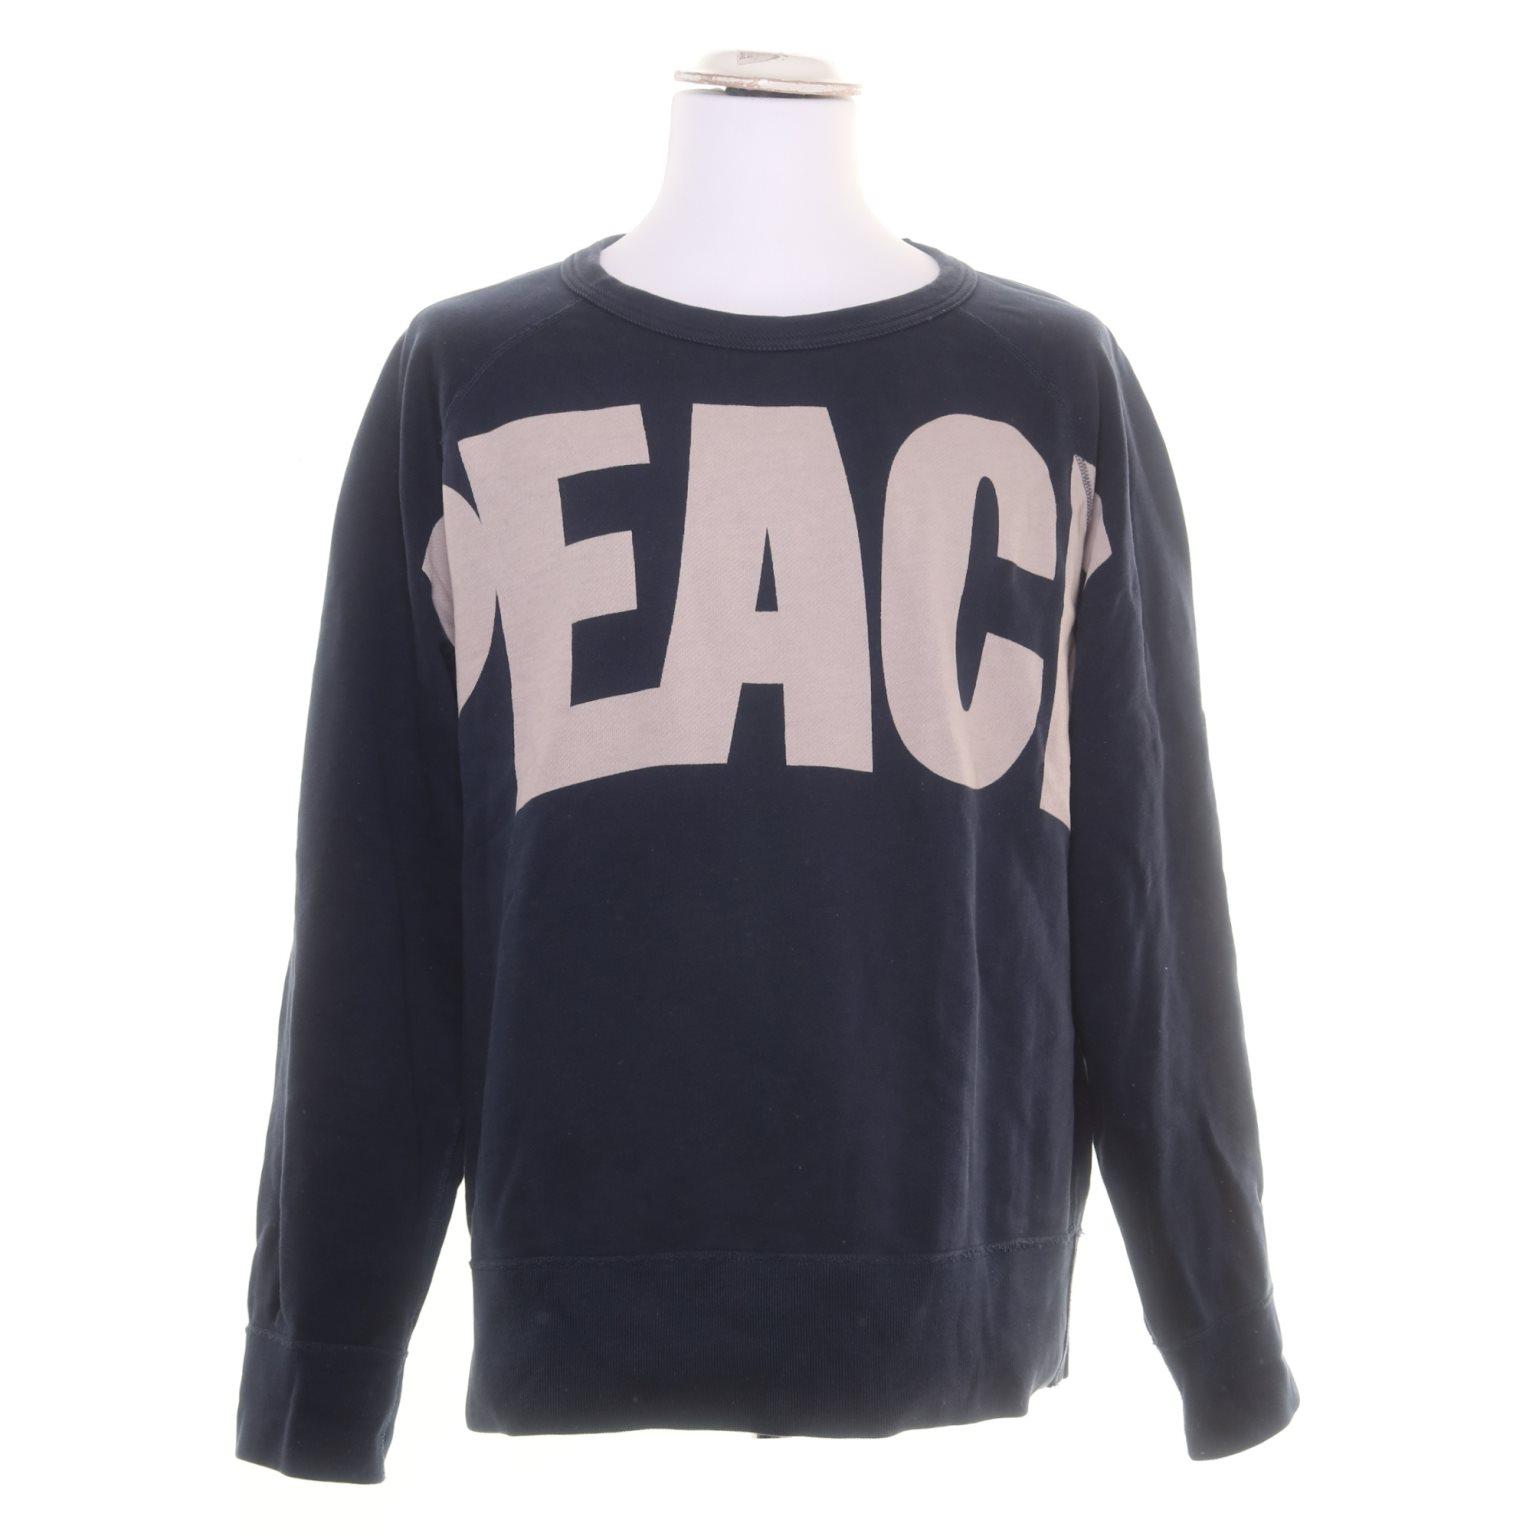 bc0dad0bb91 Acne tröja